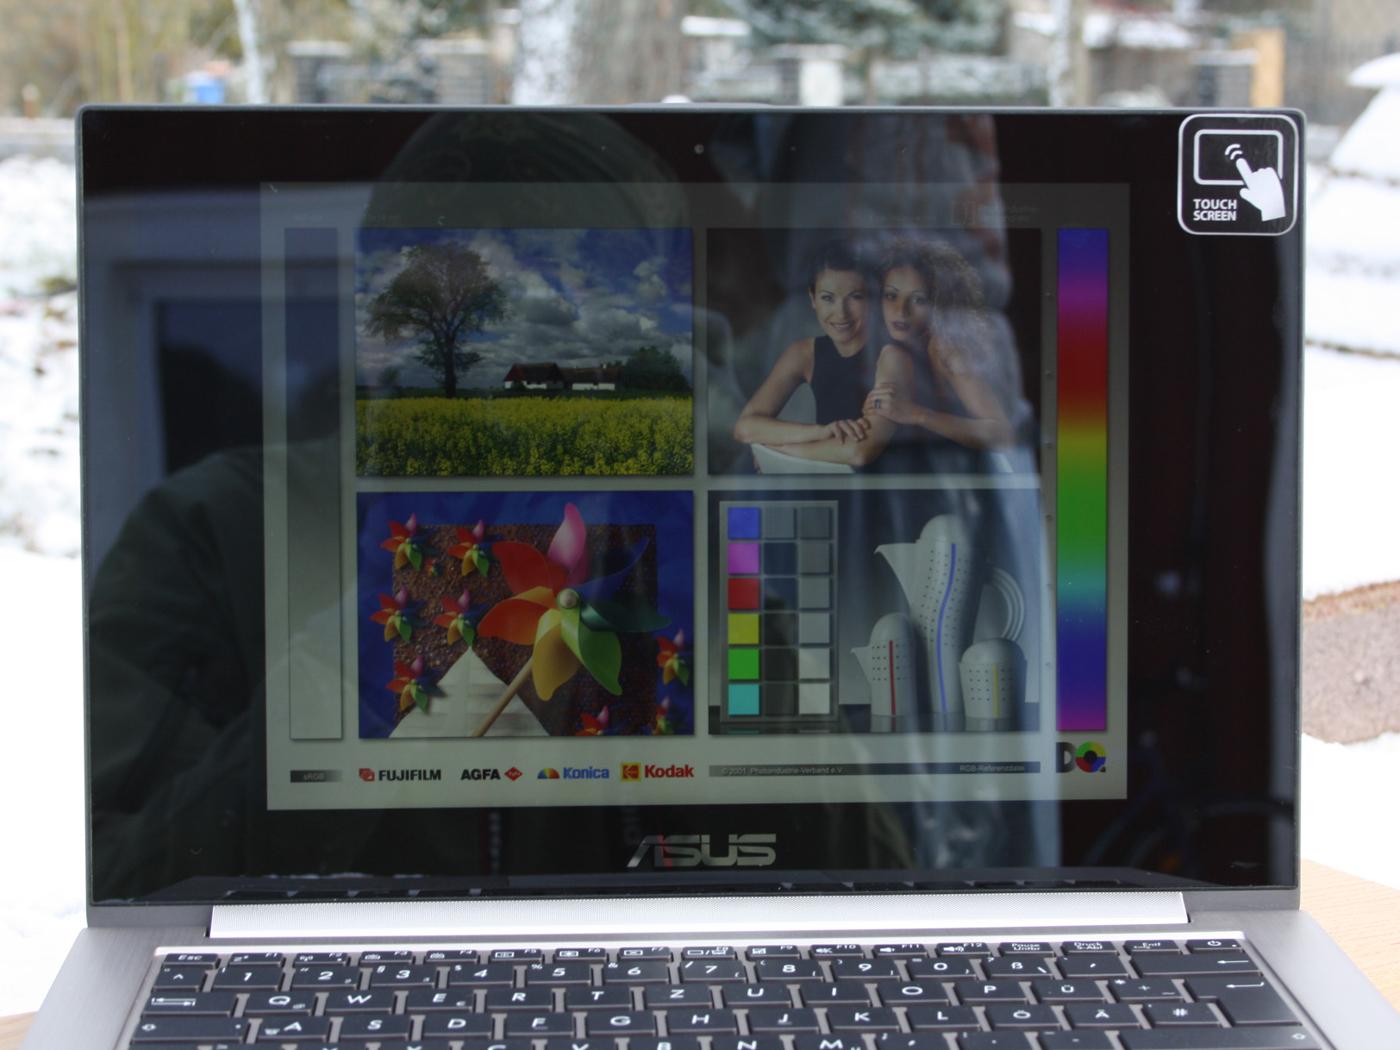 ASUS ZENBOOK Touch UX31A Keyboard Windows 8 X64